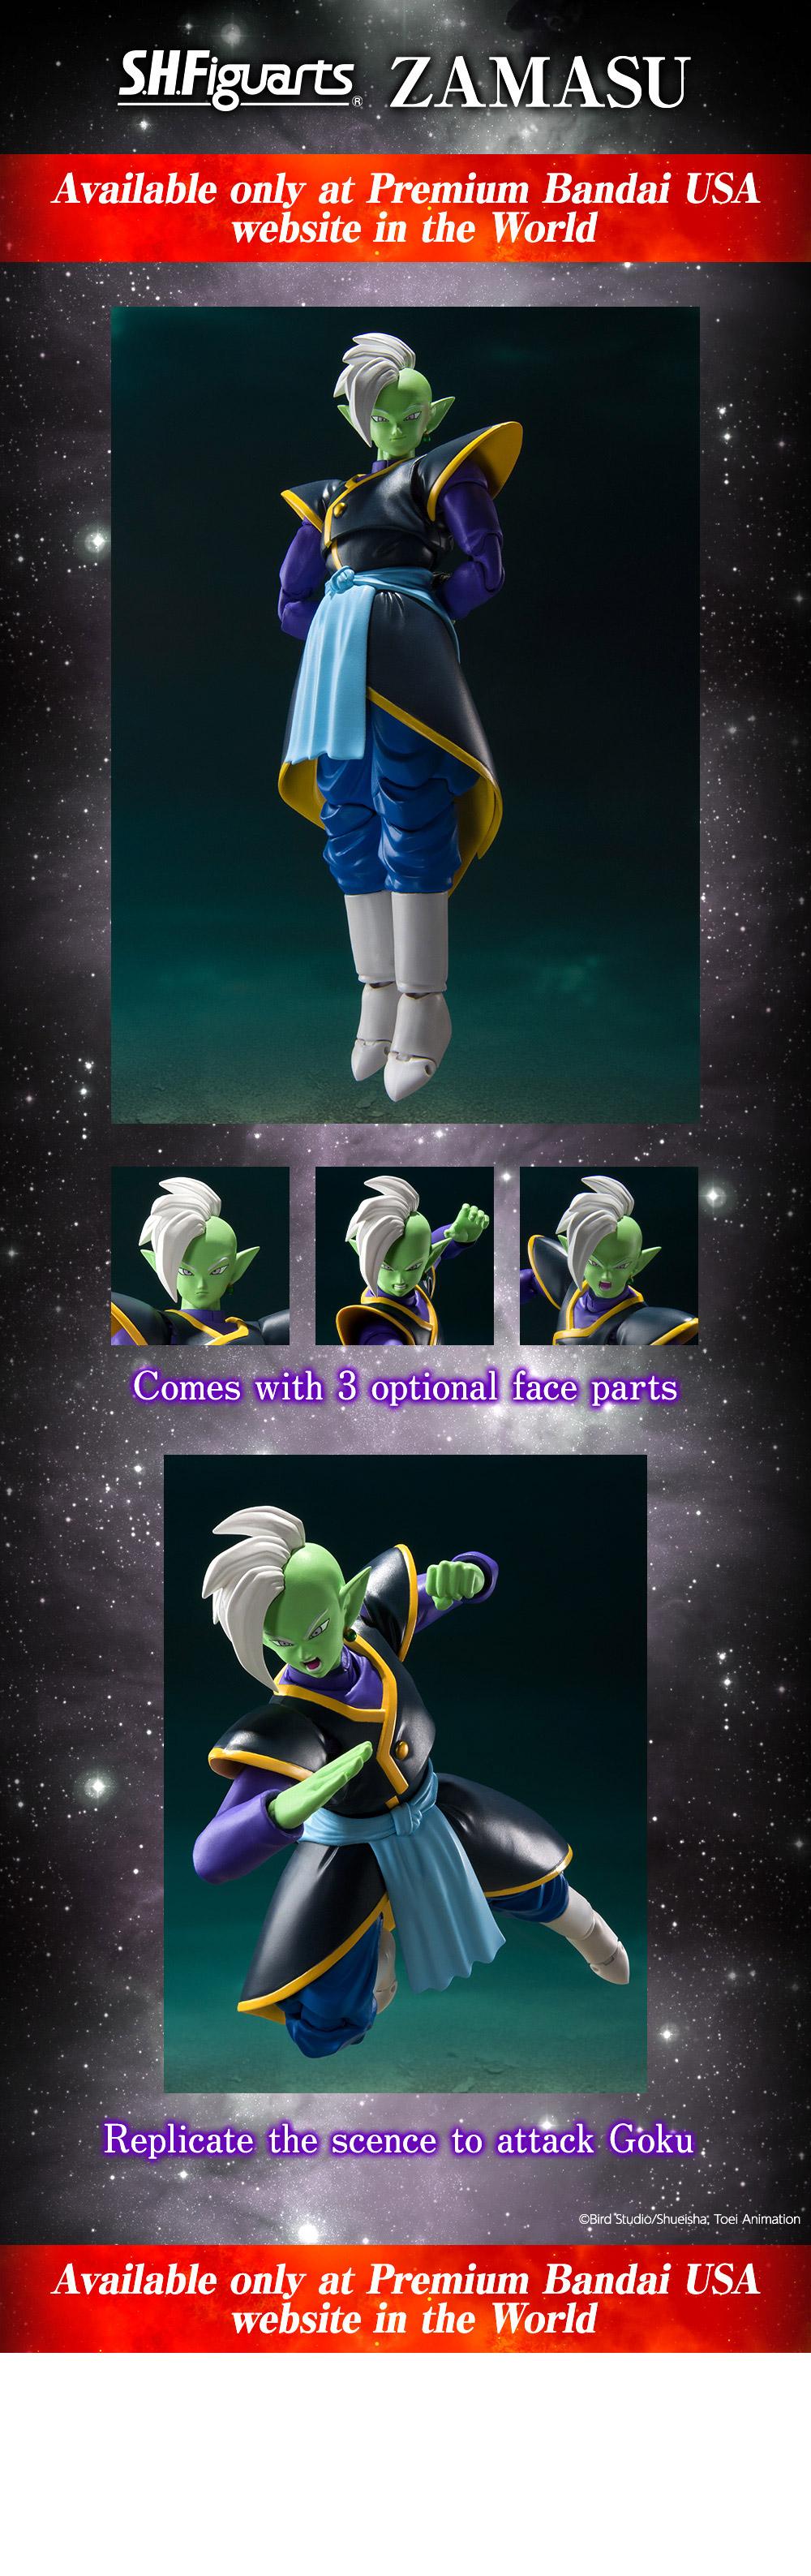 Figuarts Zamasu Bandai USA LIMITED EXCLUSIVE Dragonball Z PREORDER S.H